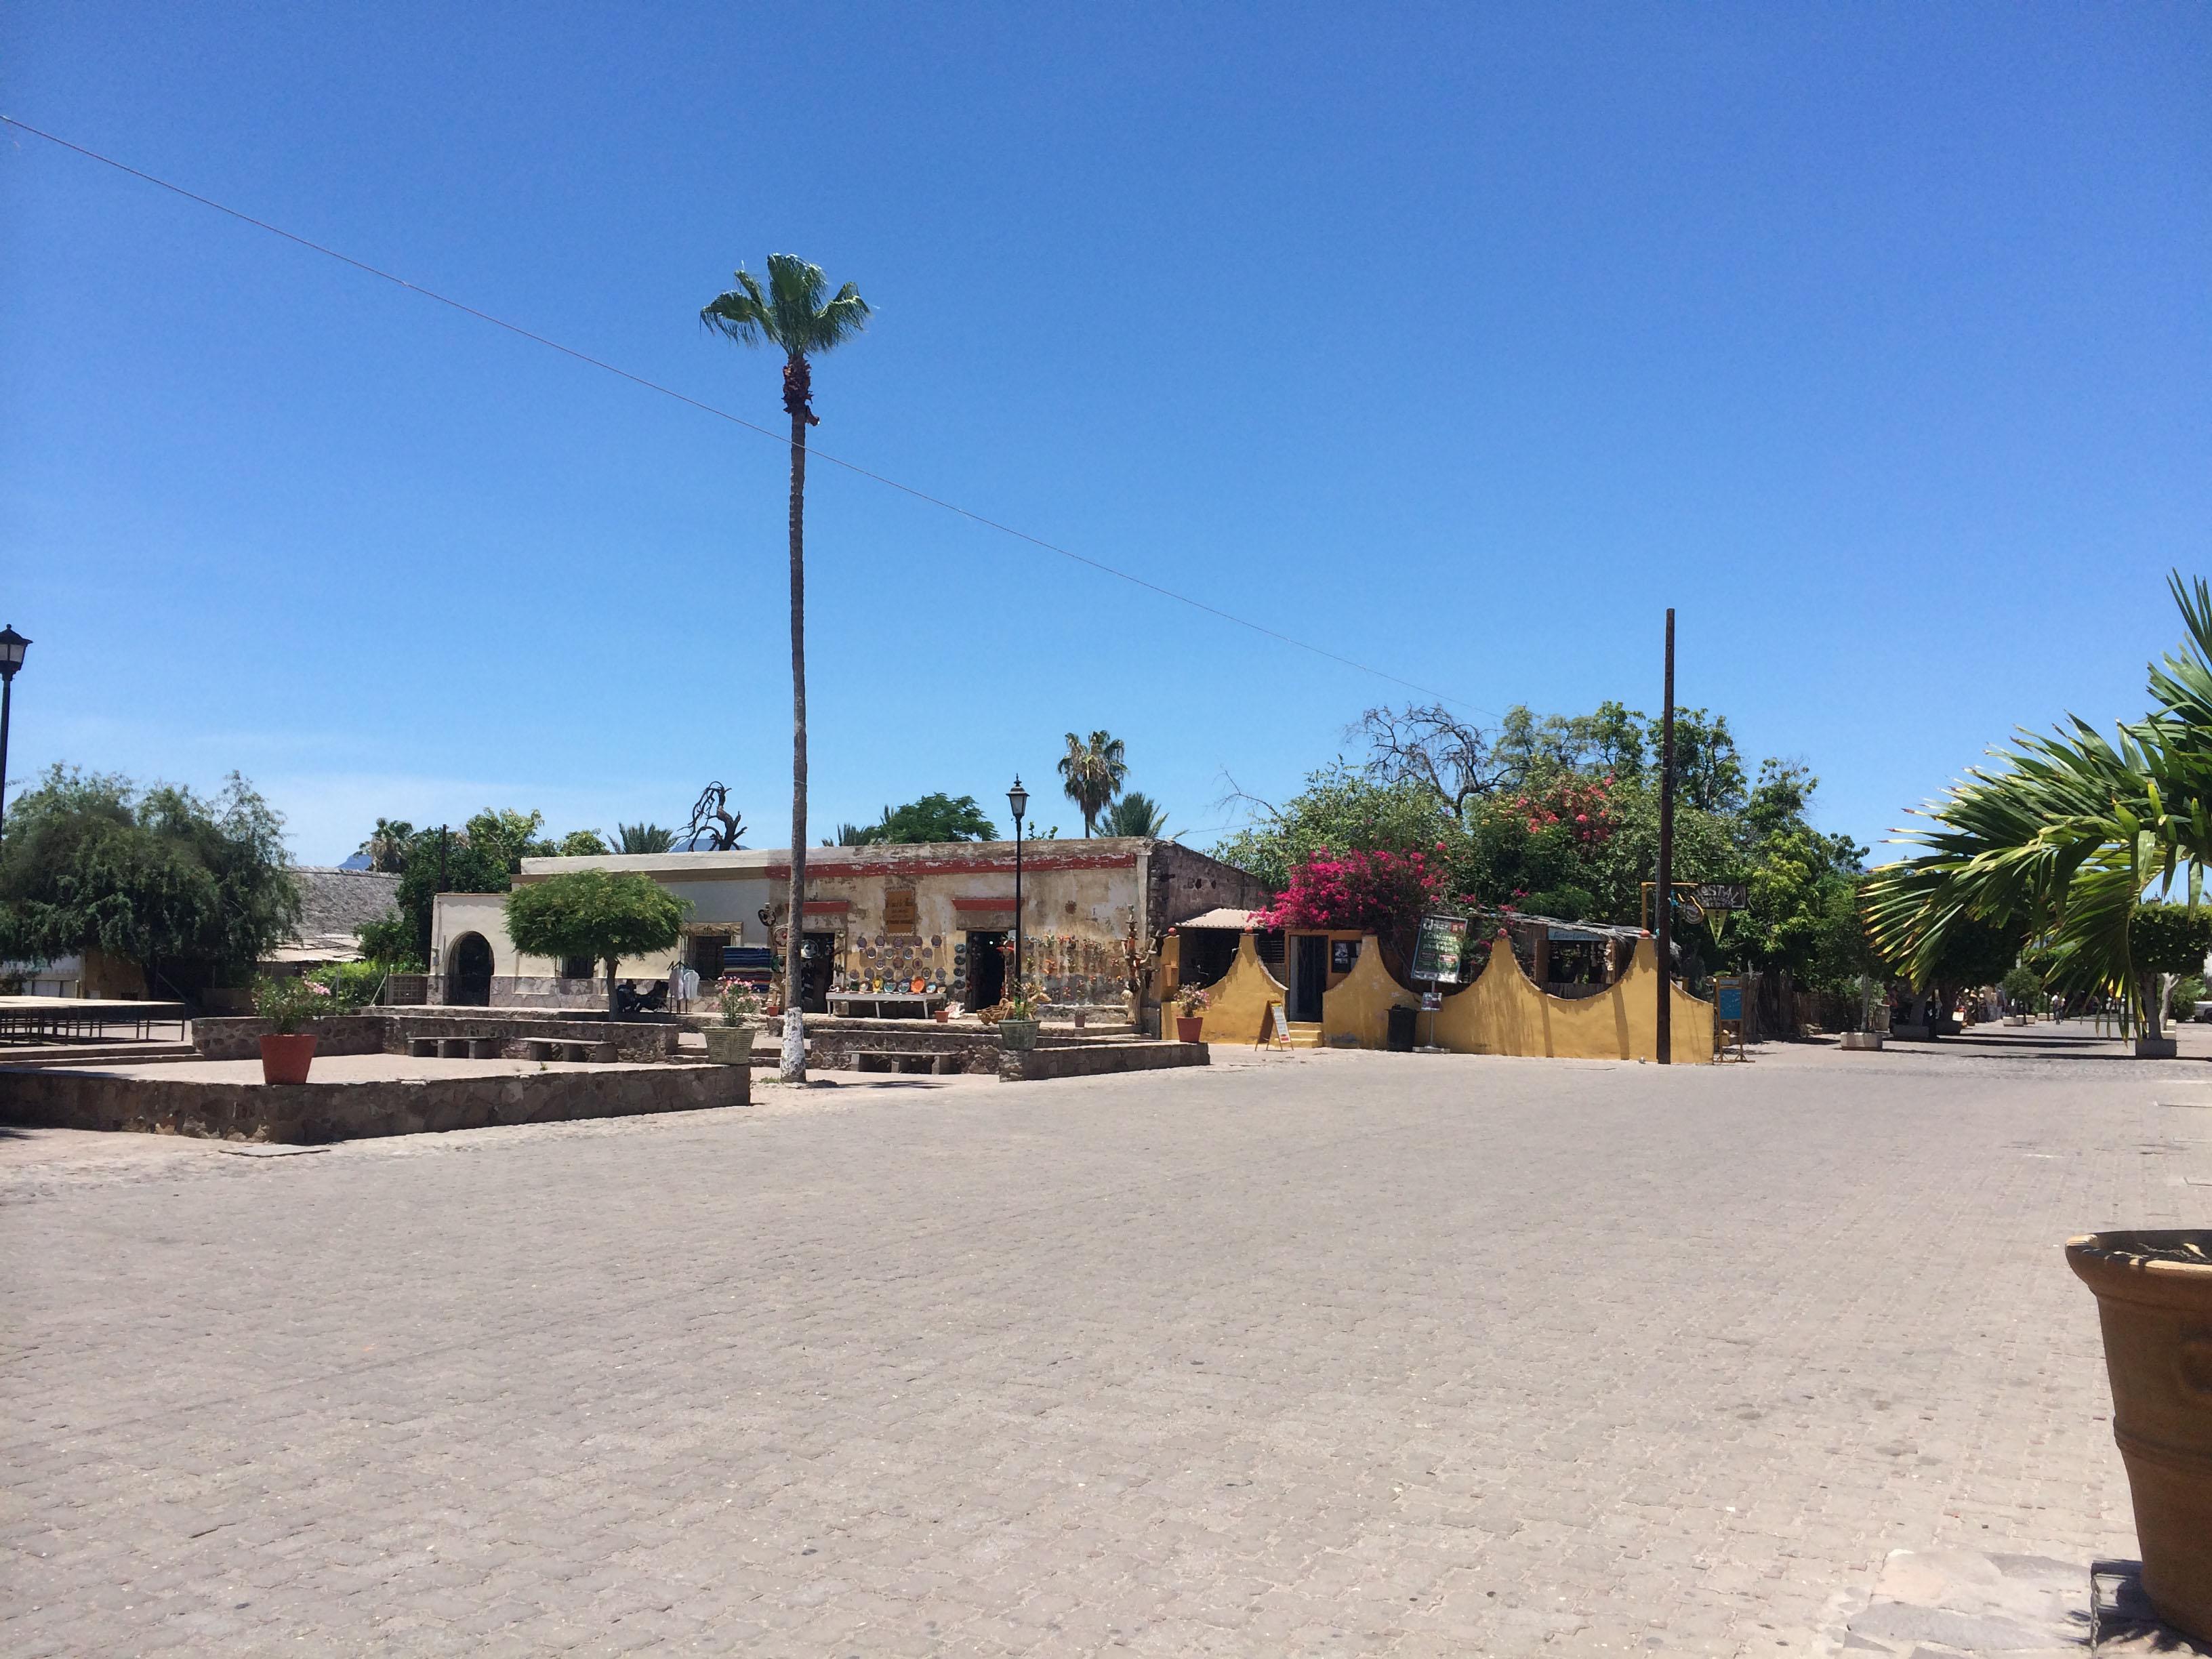 Loretotown